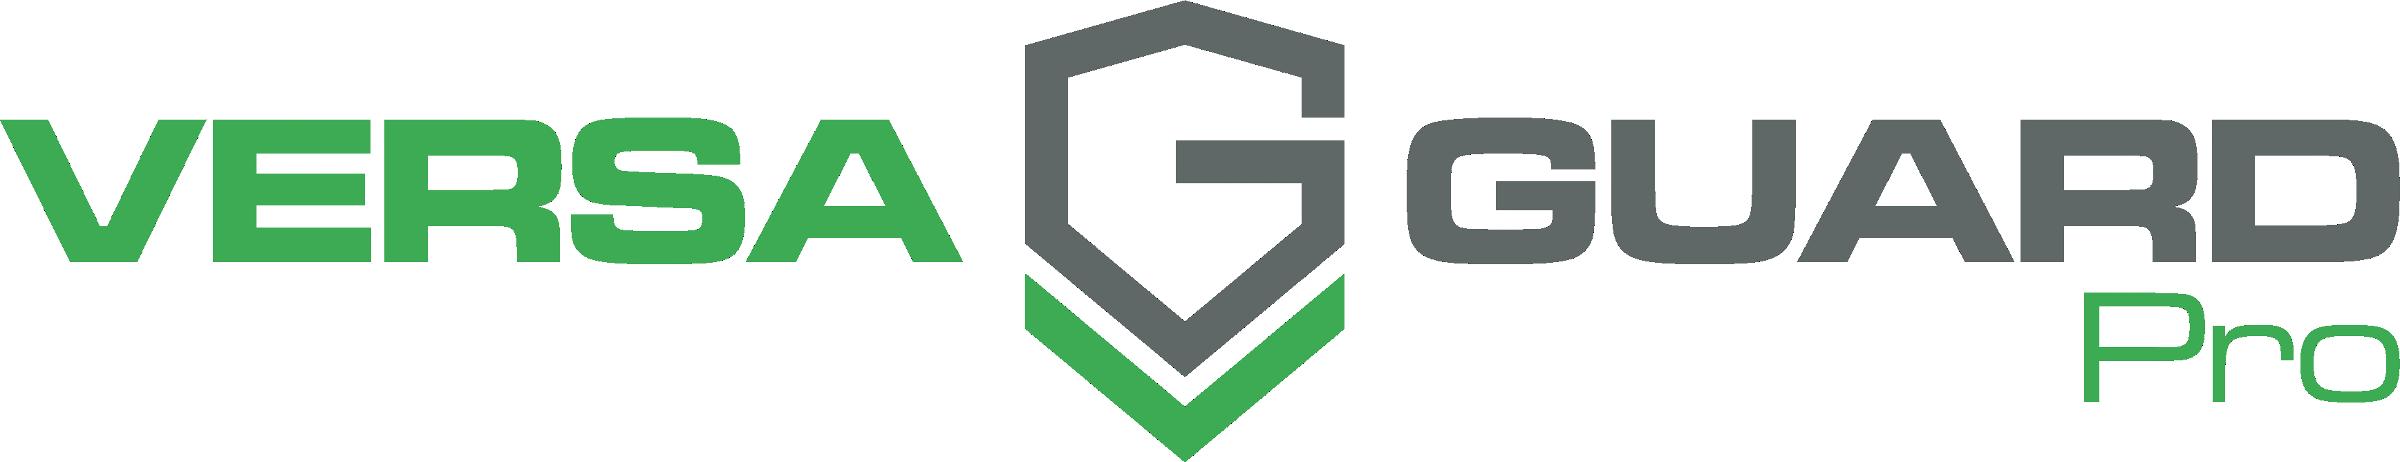 VersaGuard Pro logo